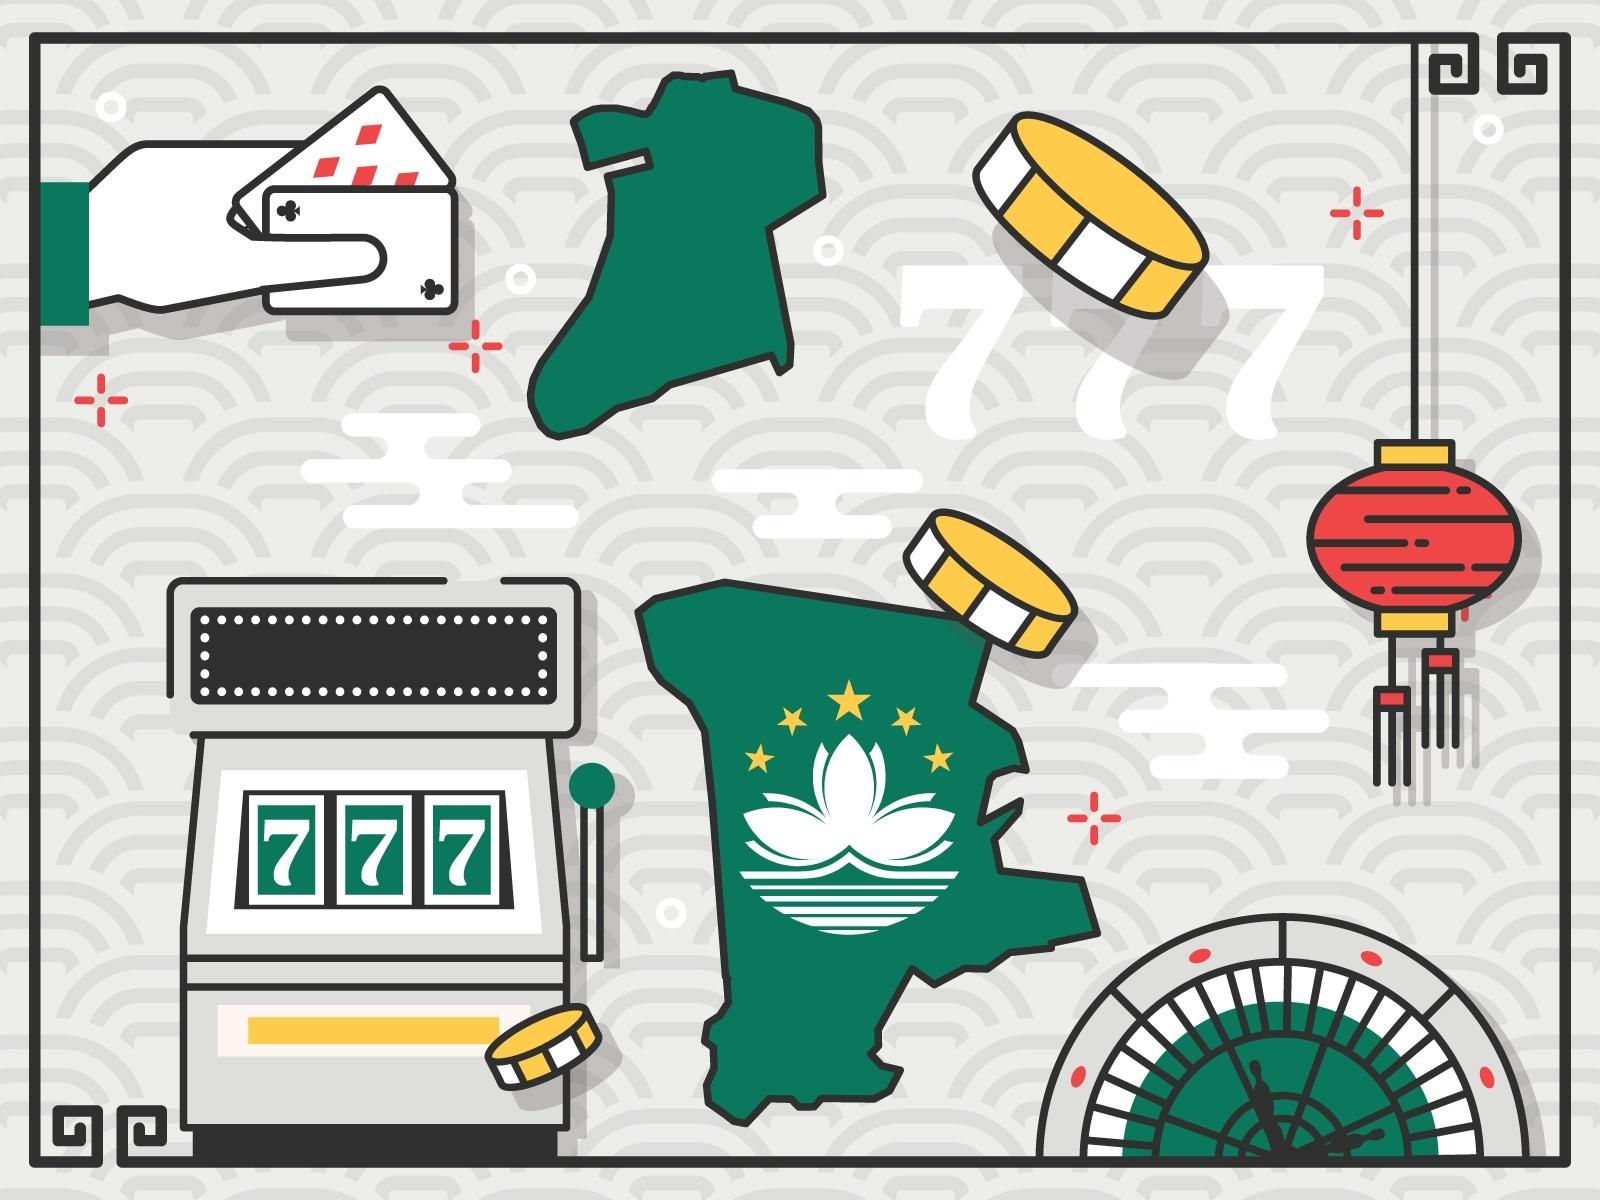 Image showing map of Macau with gambling illustrations surrounding it